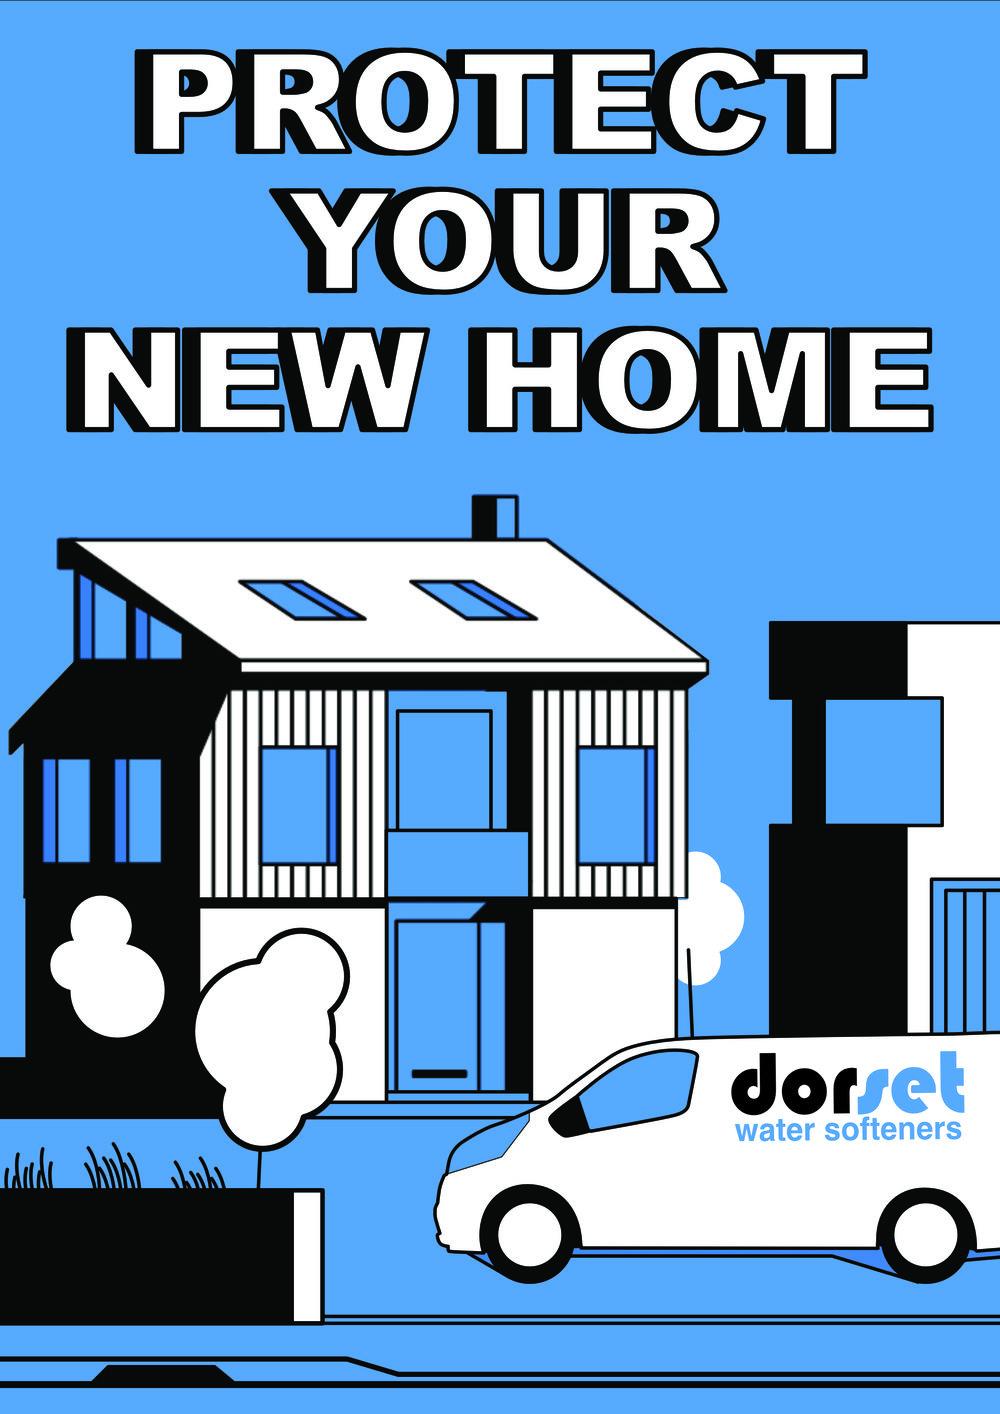 New home DWS ad.jpg